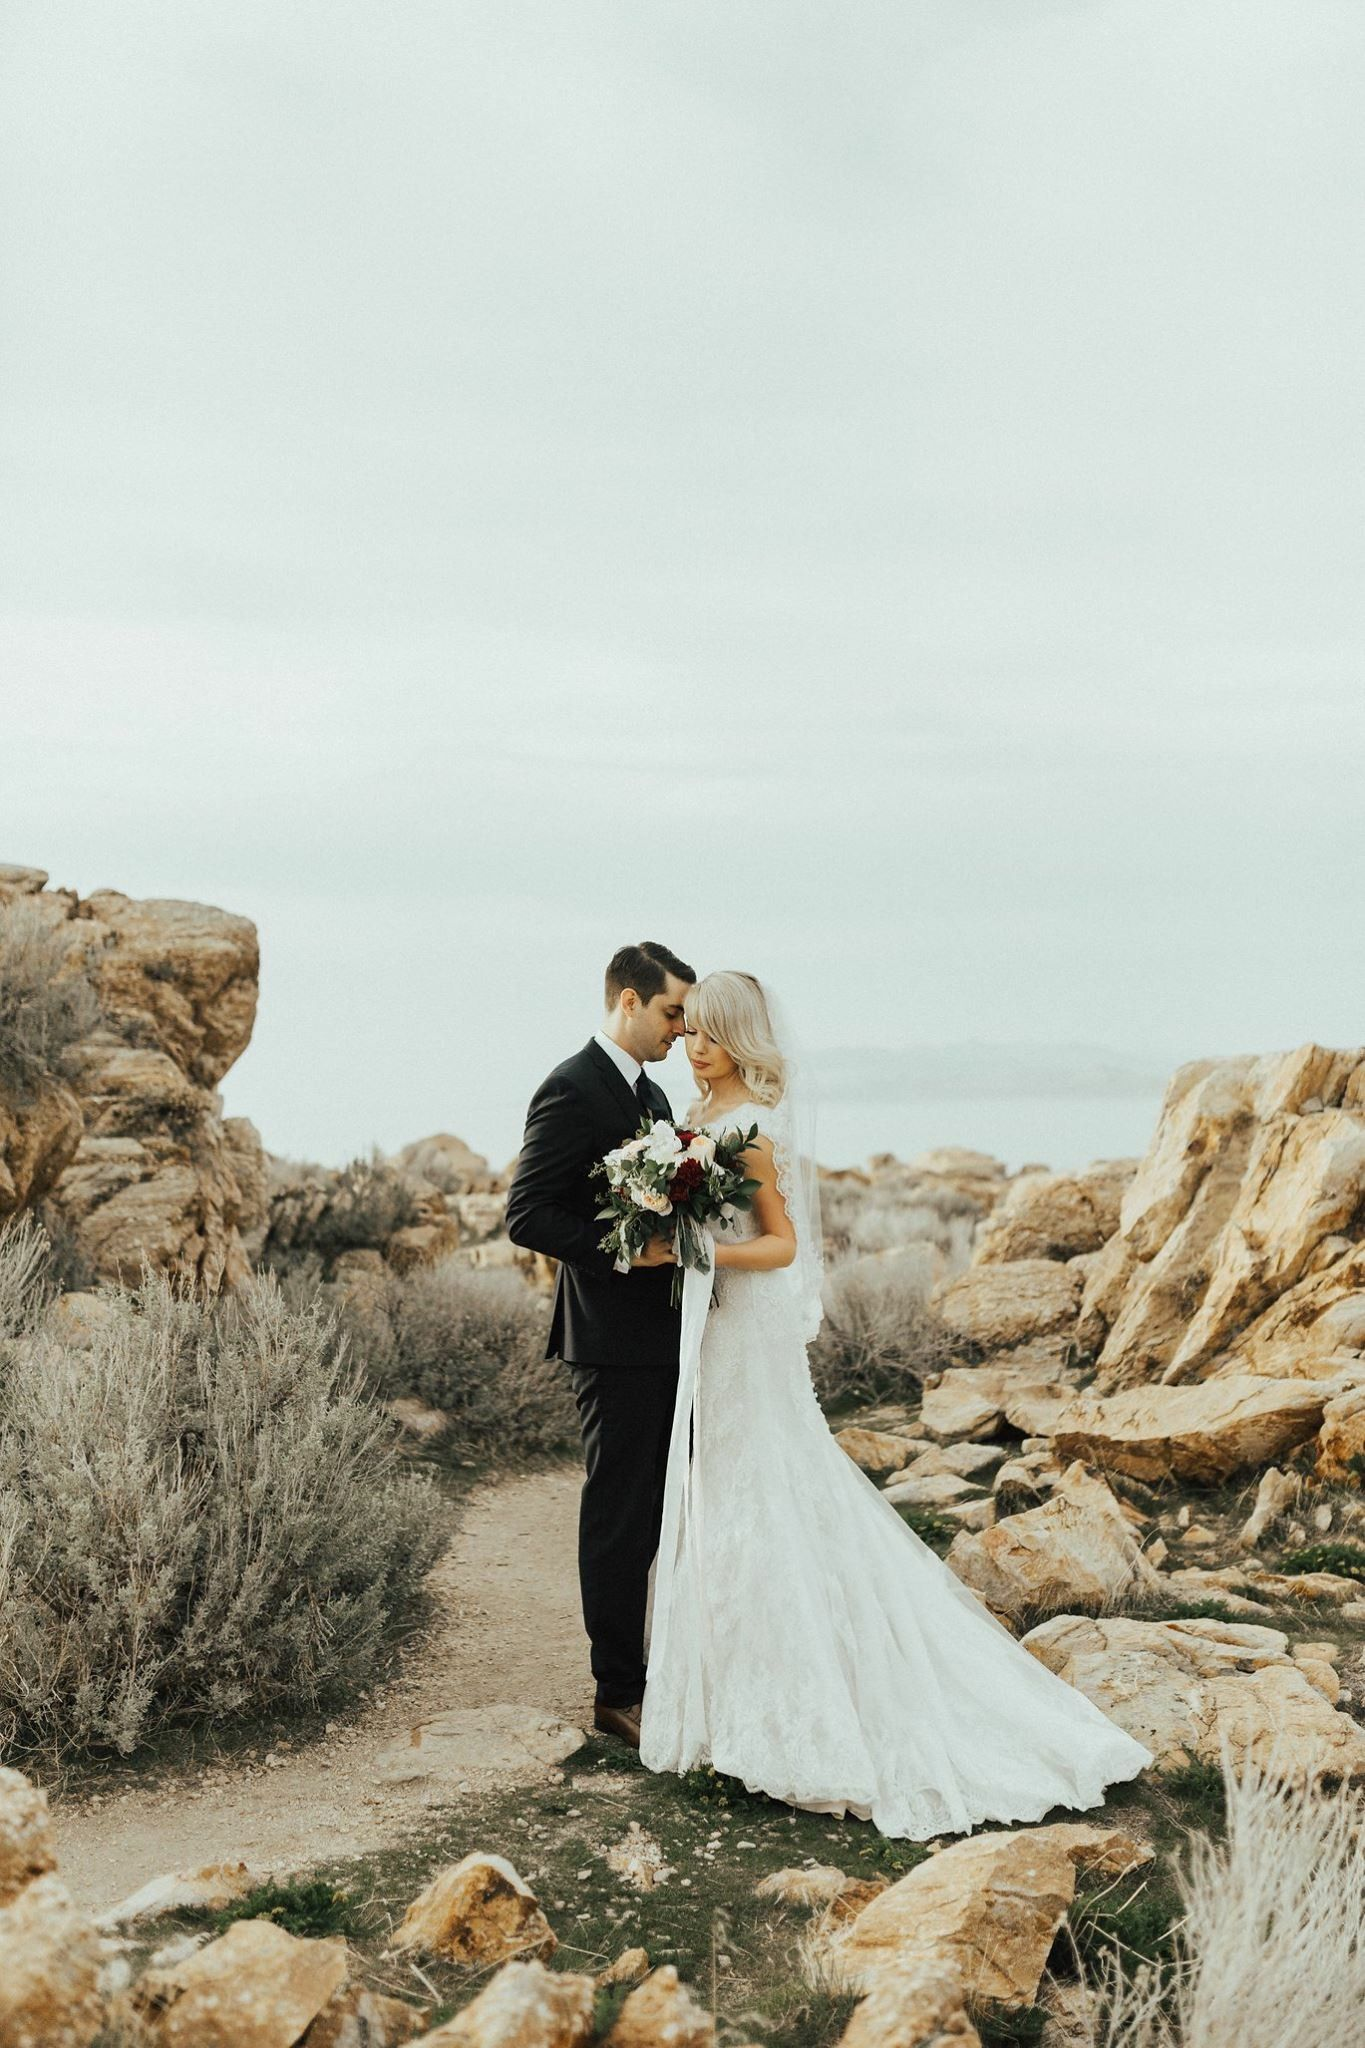 Ksl wedding dress  KR Wedding  MB EVENTS  DESIGNS  Pinterest  Weddings